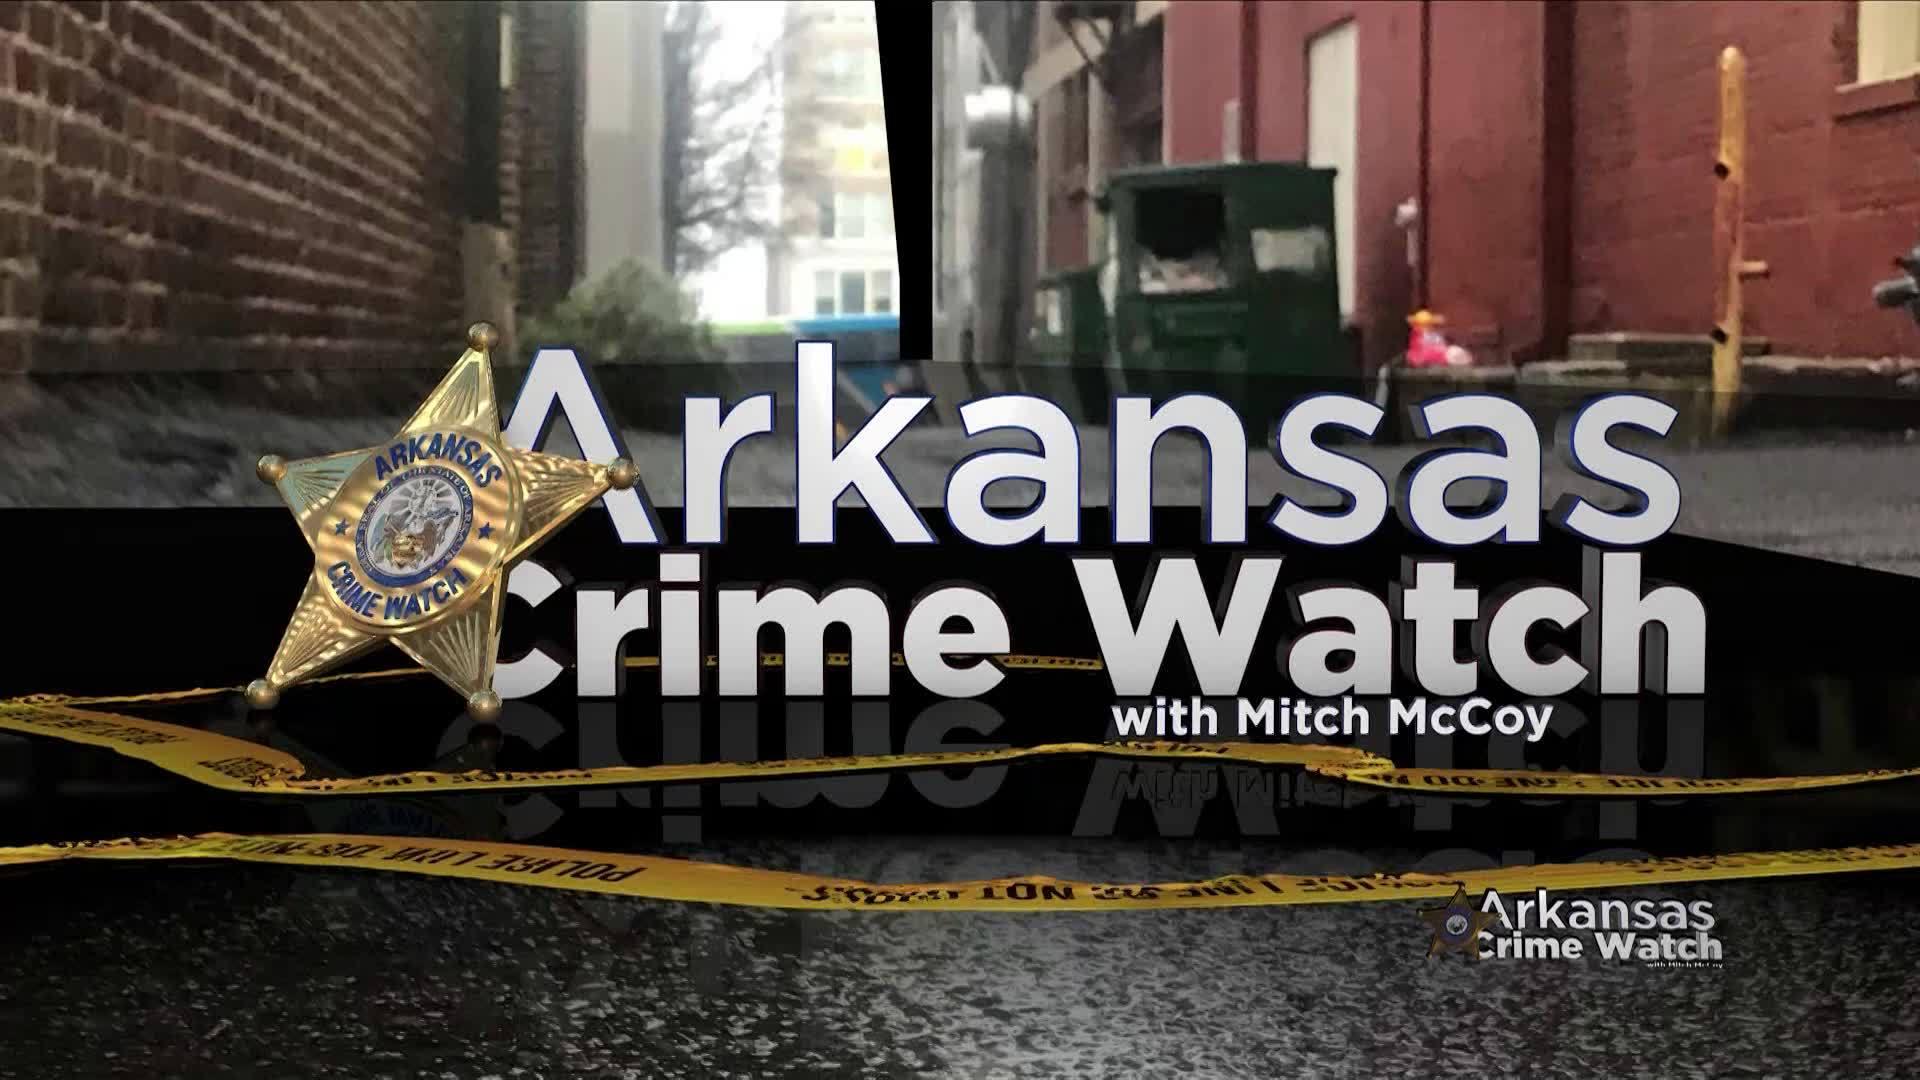 Arkansas_Crime_Watch__Sunday__May_19__20_0_20190518010836